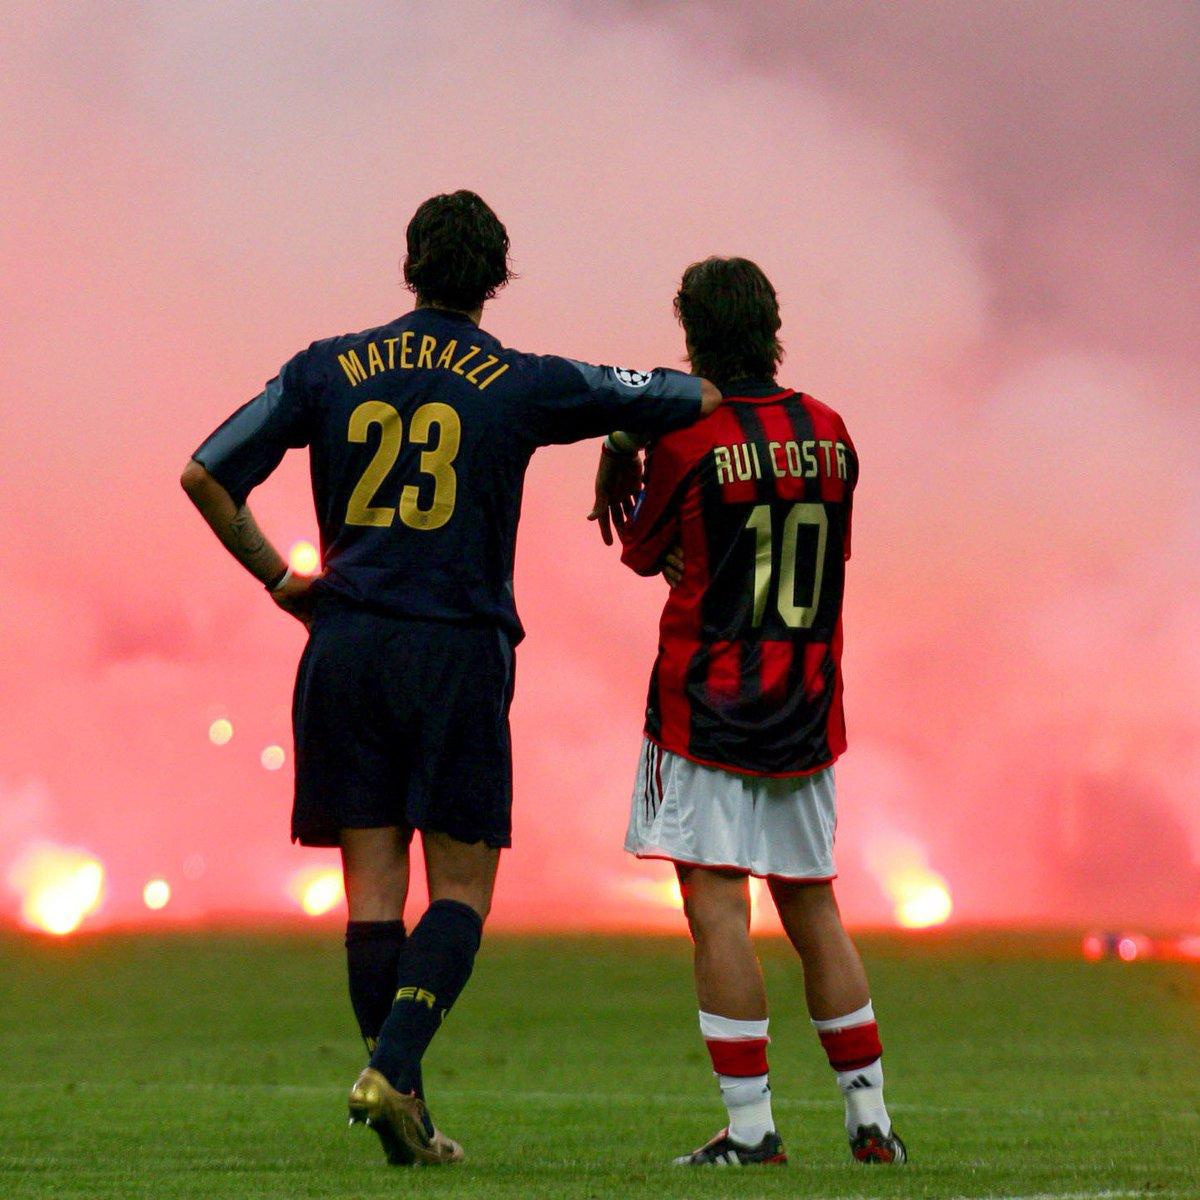 💥 . . #ruicosta #materazzi #acmilan #acmilan1899 #fcinter #internazionale #inter #intermilan #rossoneri #neroazzurri #amala #calcio #football #futbol #futebol #fussball #soccer https://t.co/n5bl4V6DsH